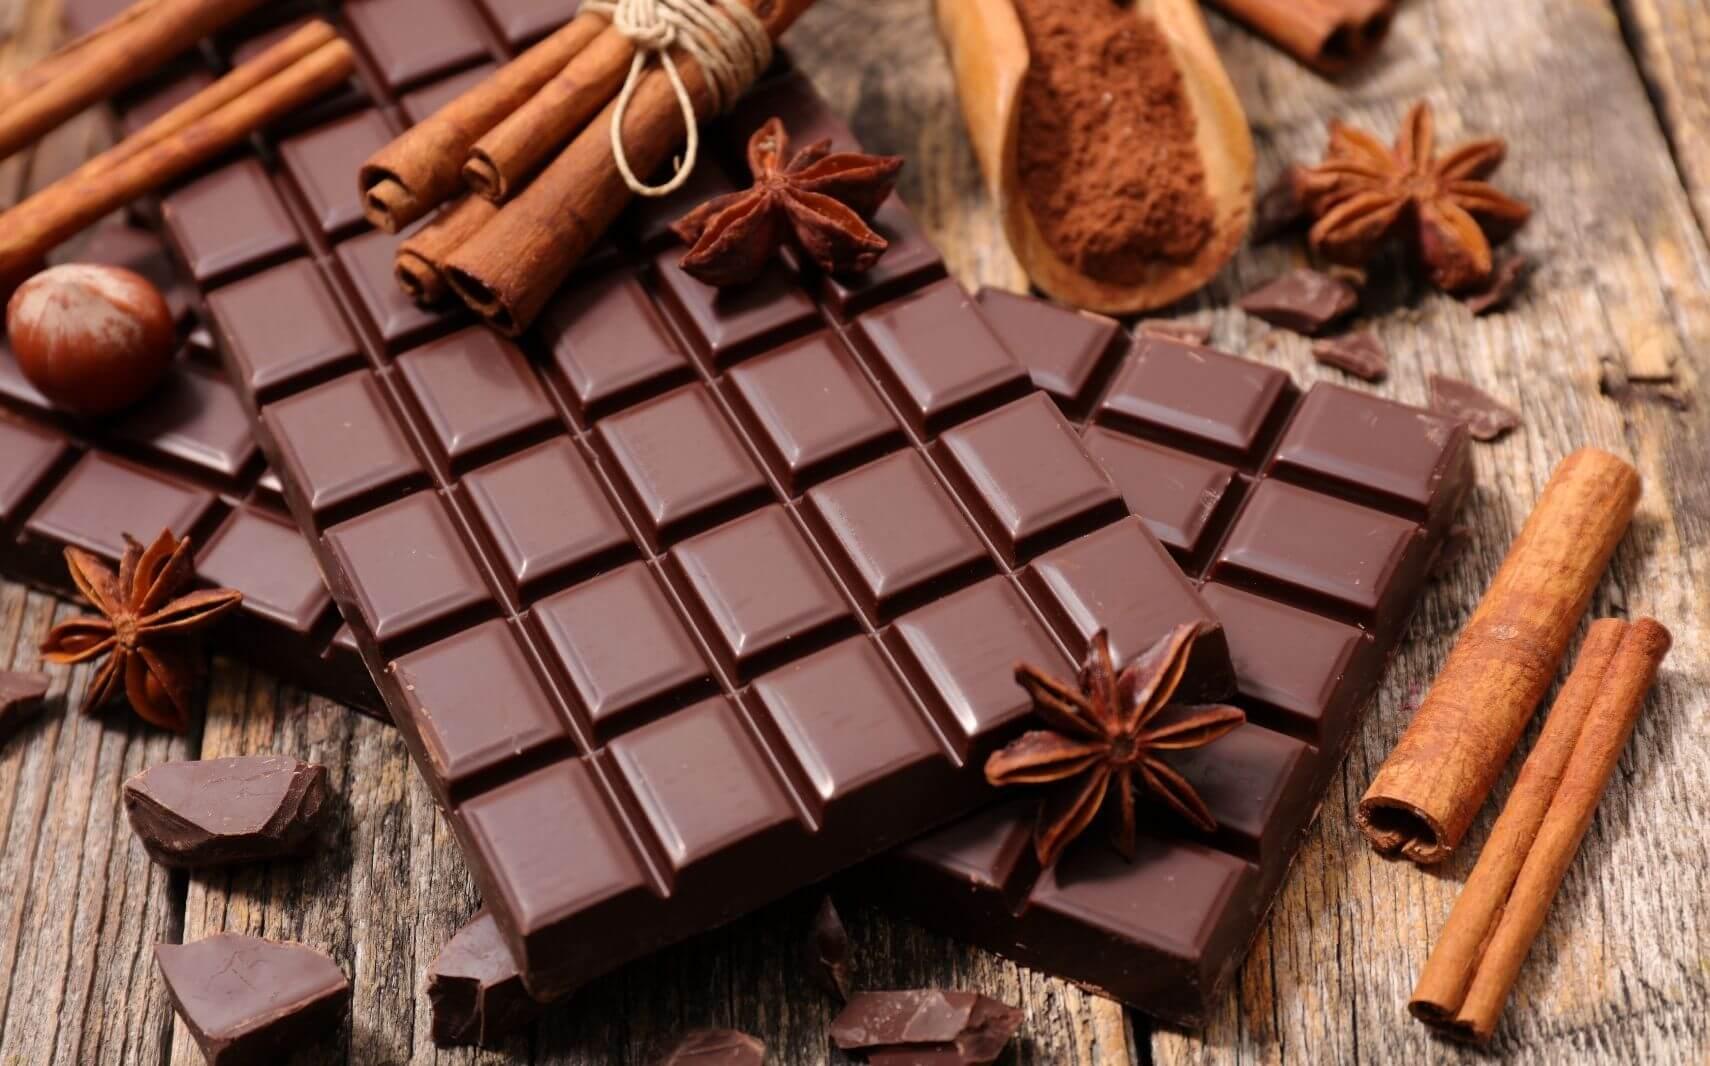 CHOCOLATE & SUGAR BITES